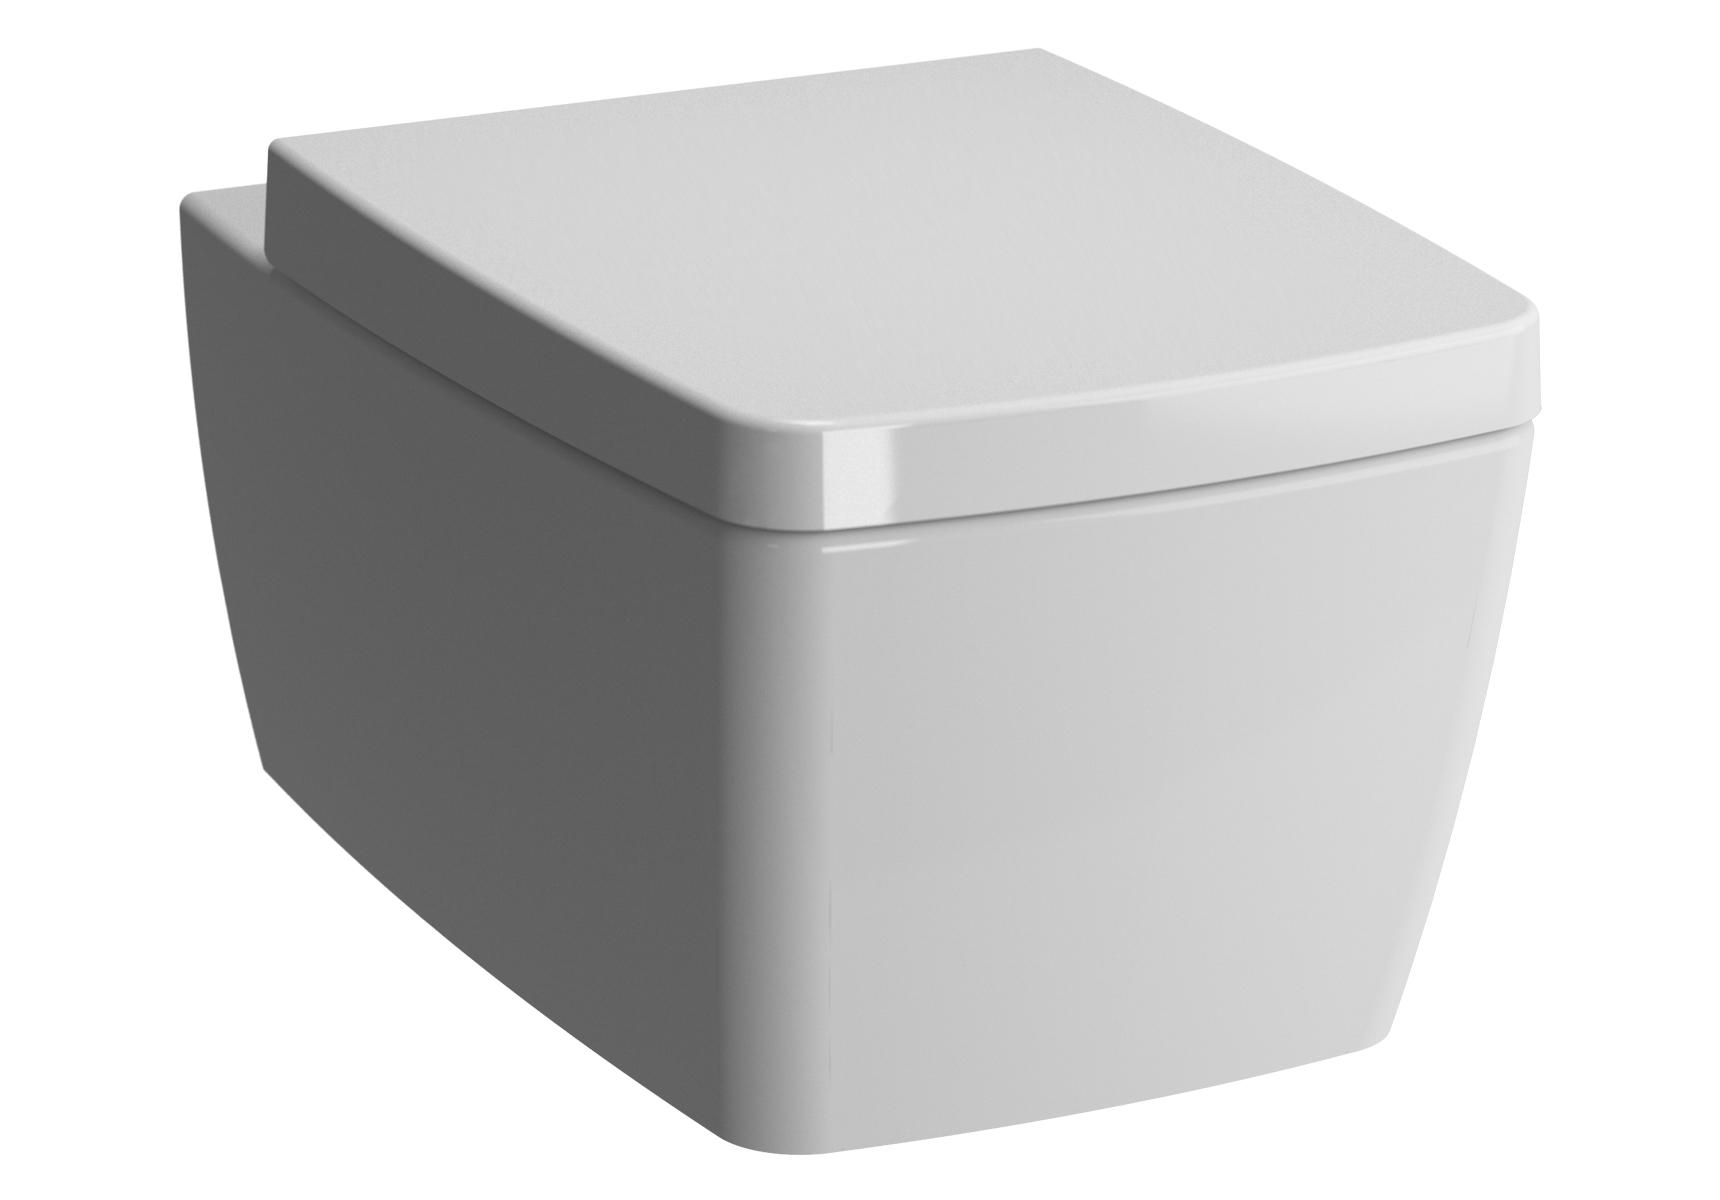 Metropole Wand-WC Tiefspüler